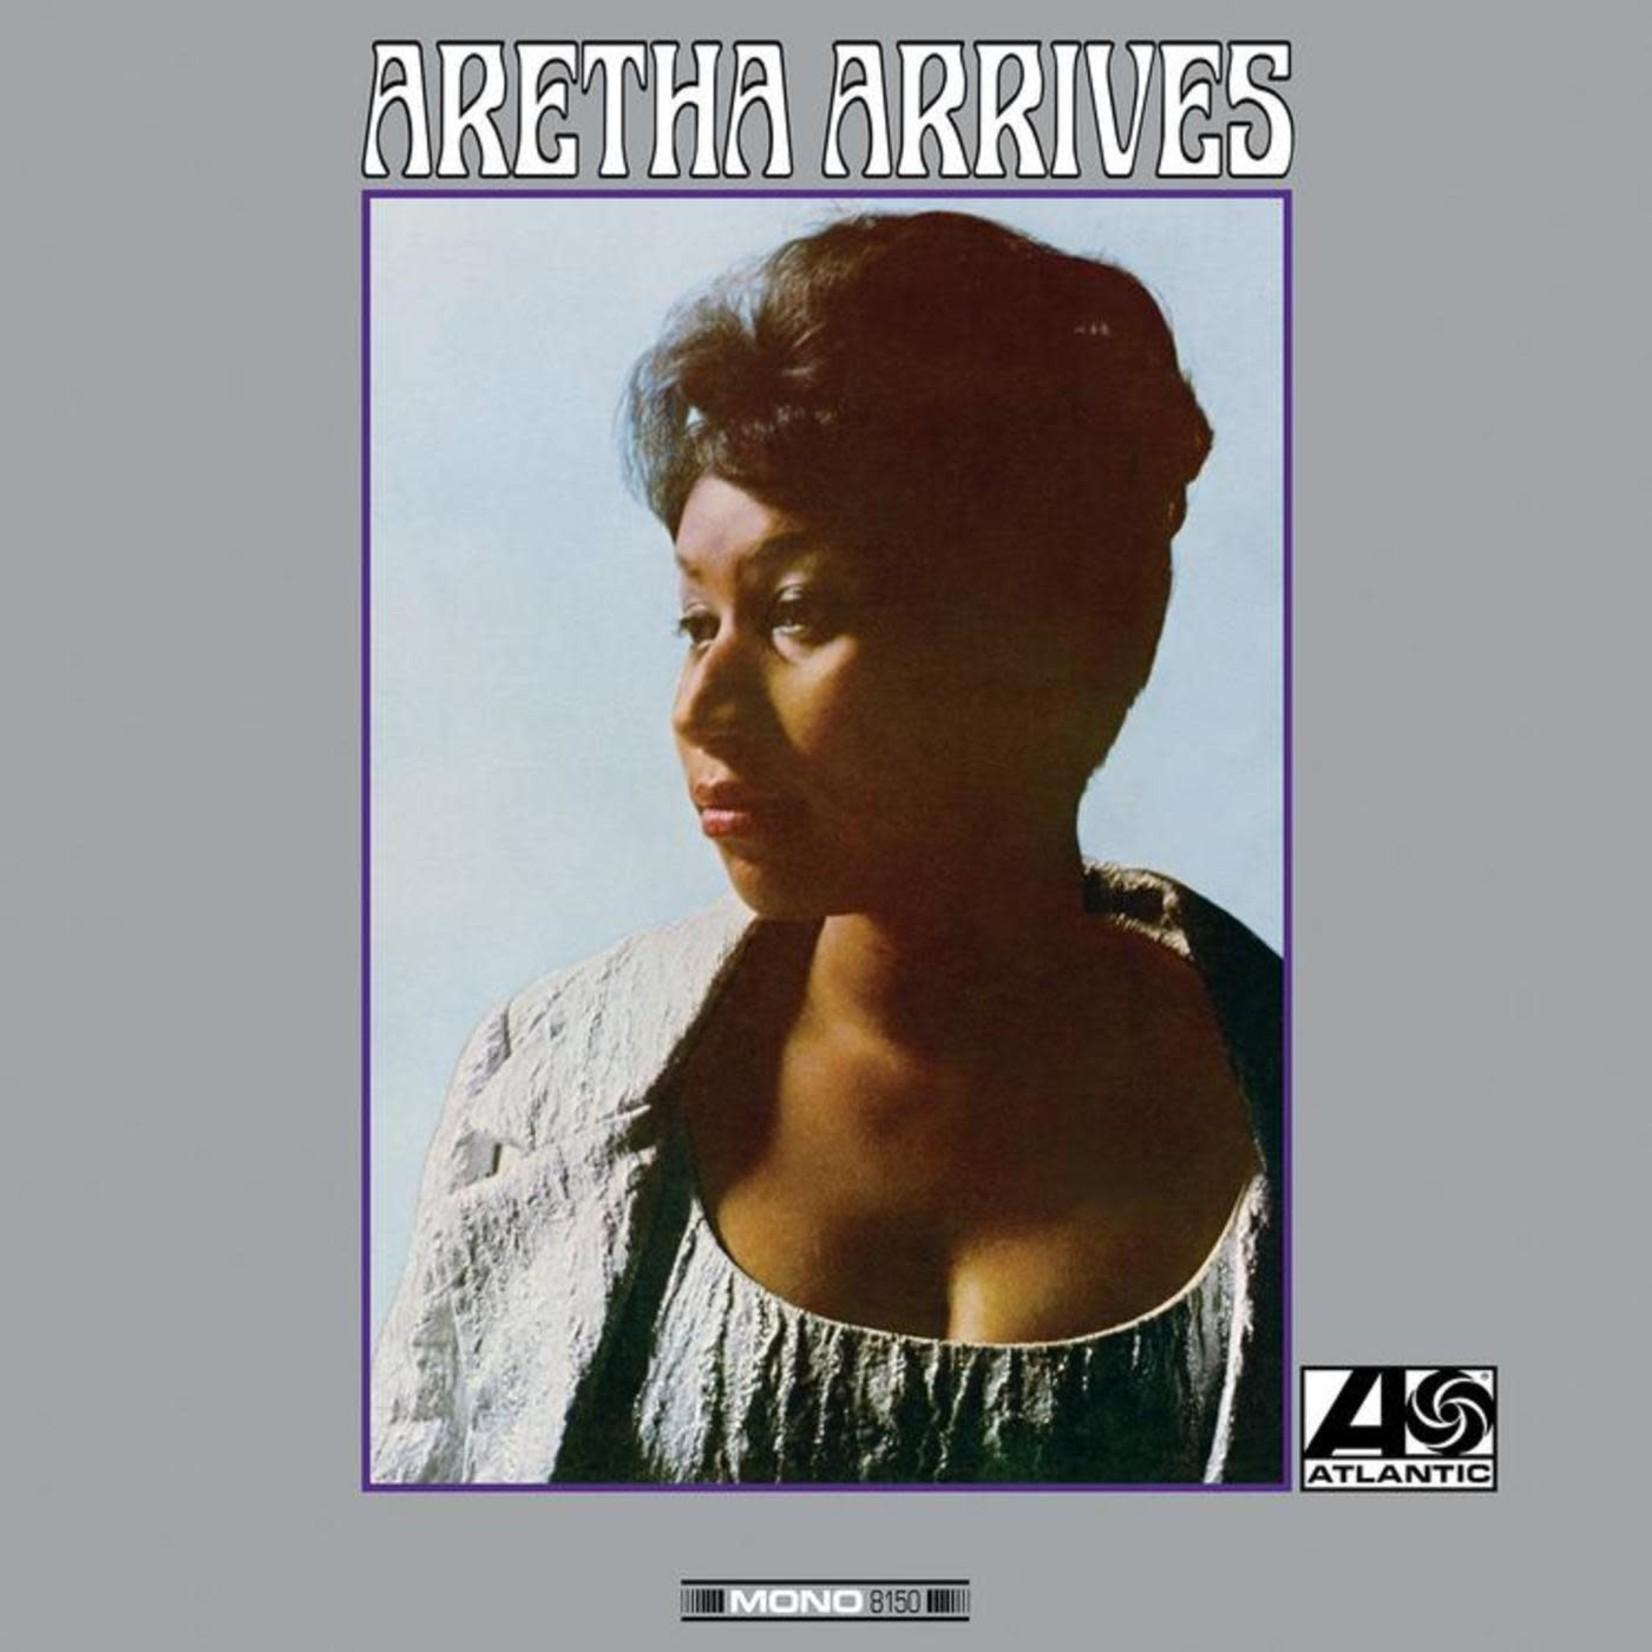 [New] Franklin, Aretha: Aretha Arrives (50th Anniversary Ed., mono mix)